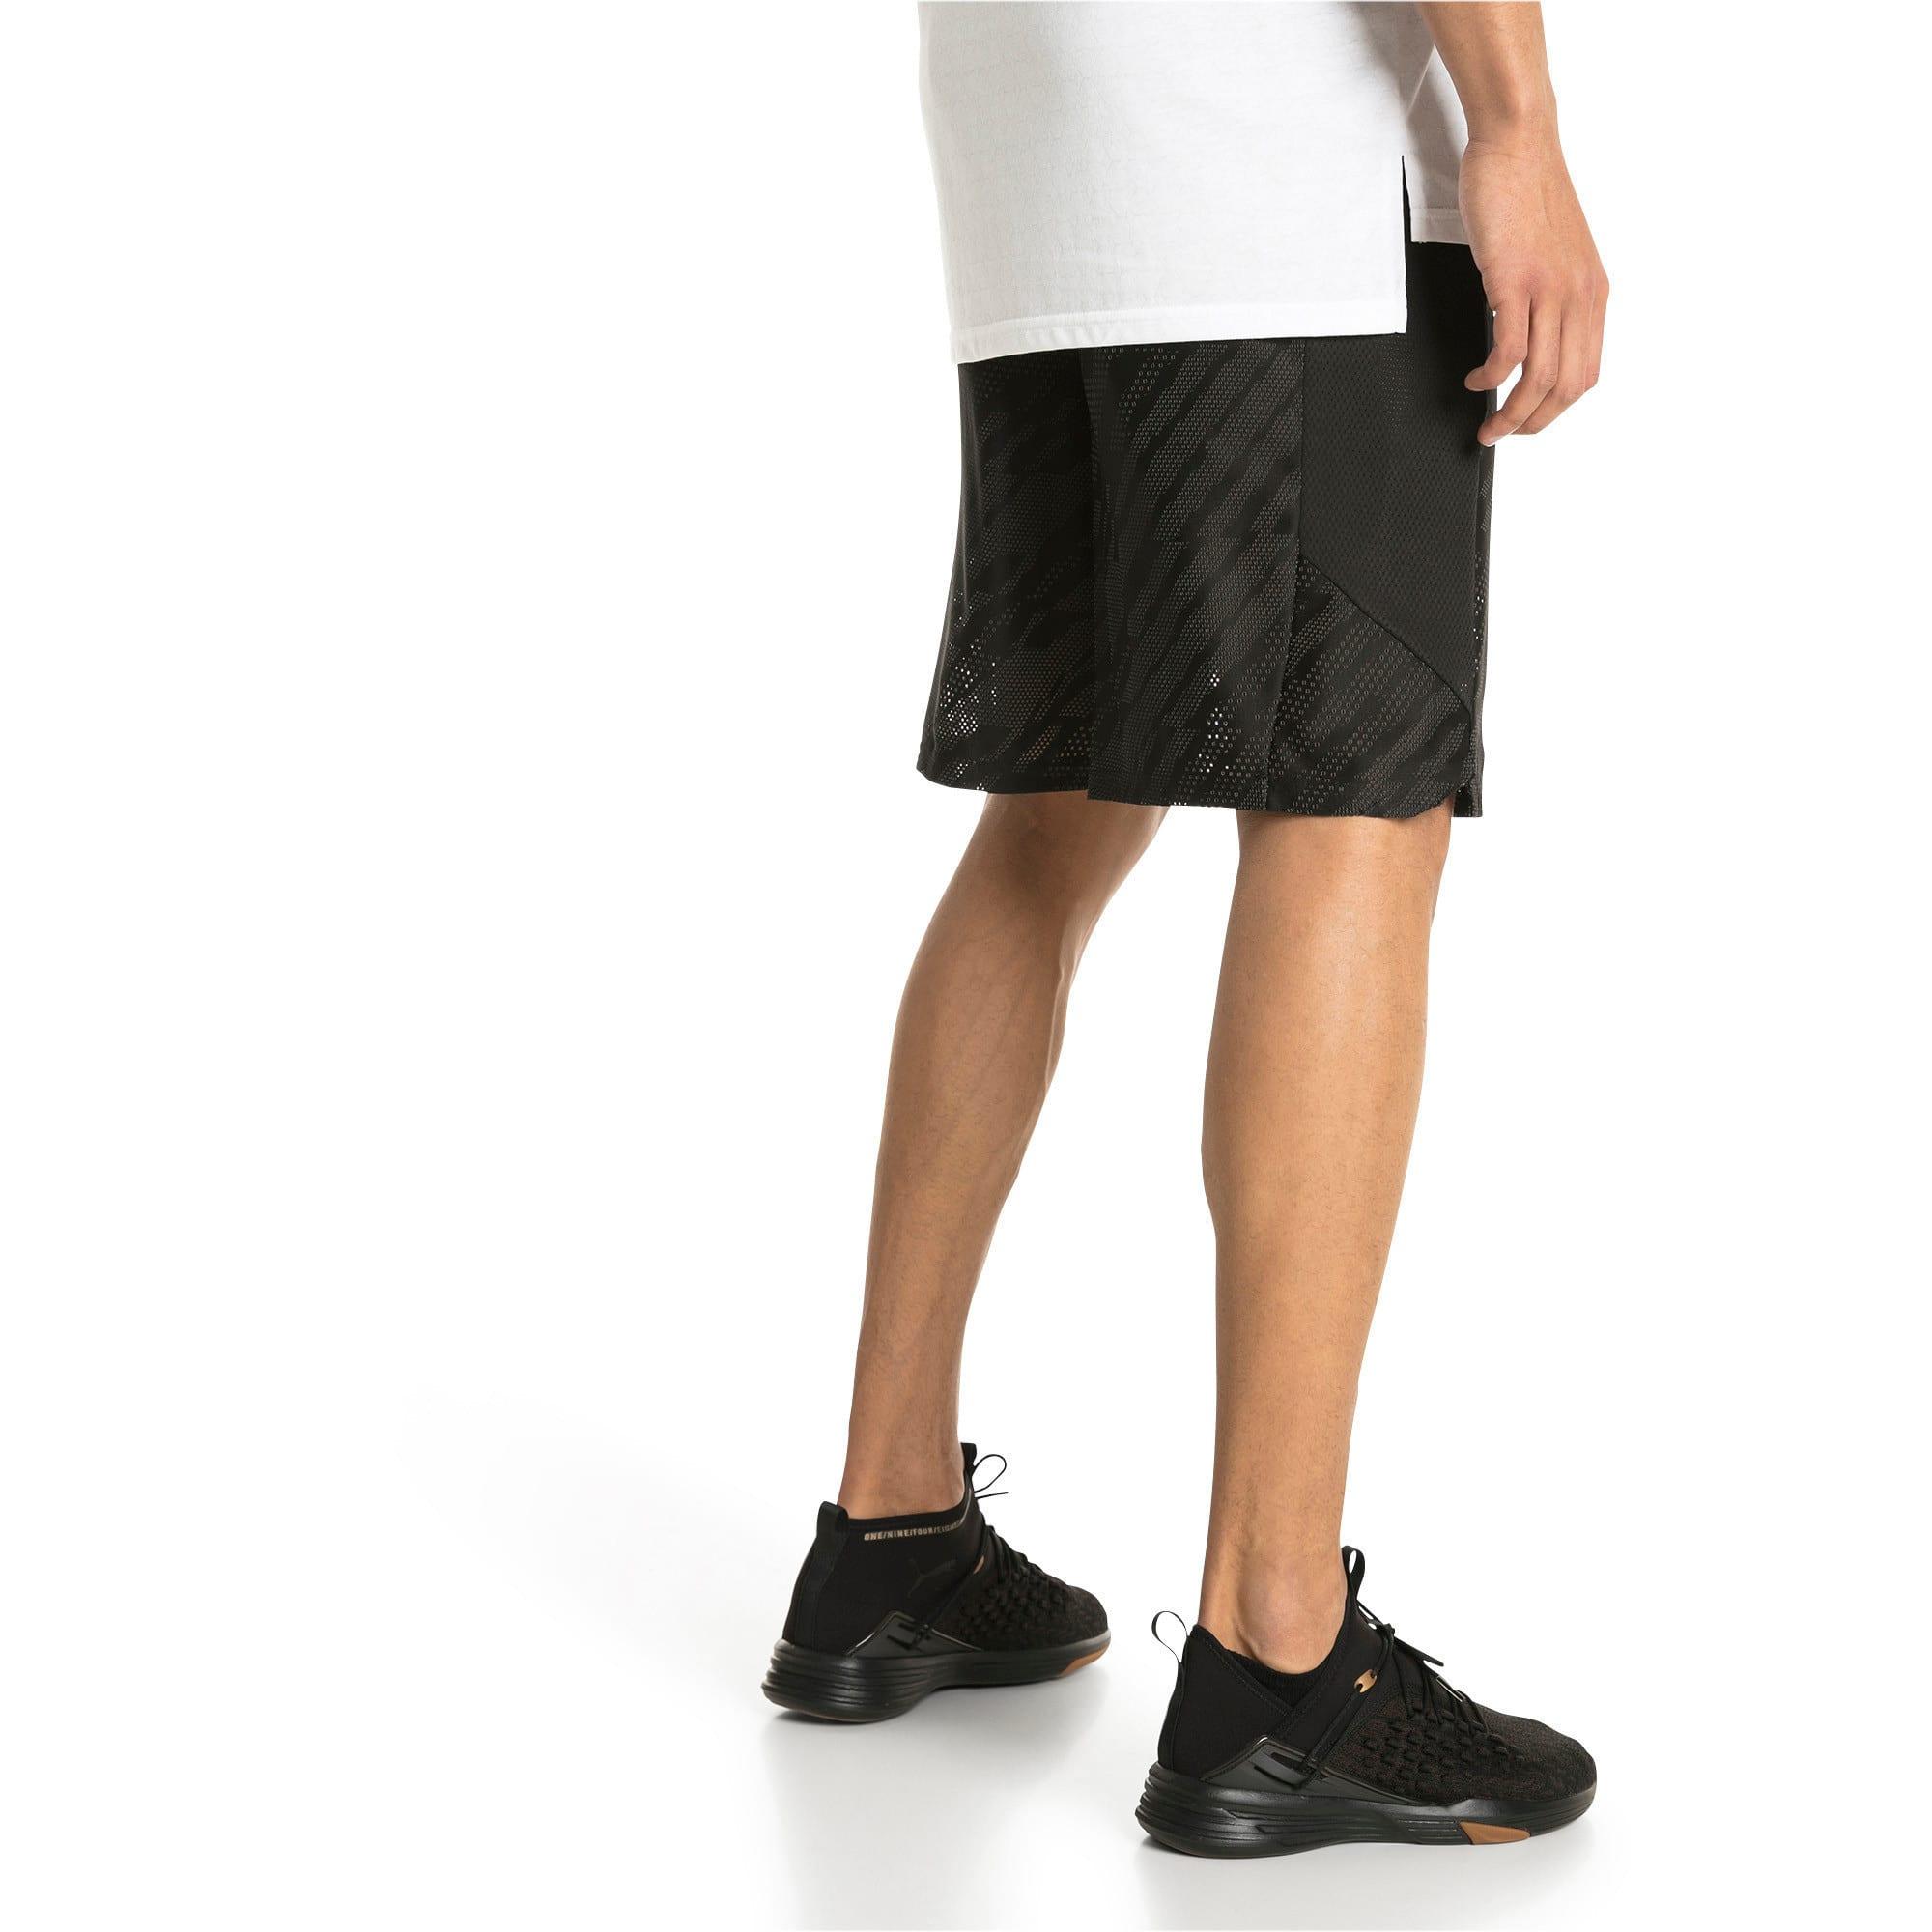 "Thumbnail 2 of VENT 10"" Men's Knit Shorts, Puma Black-Iron Gate, medium-IND"